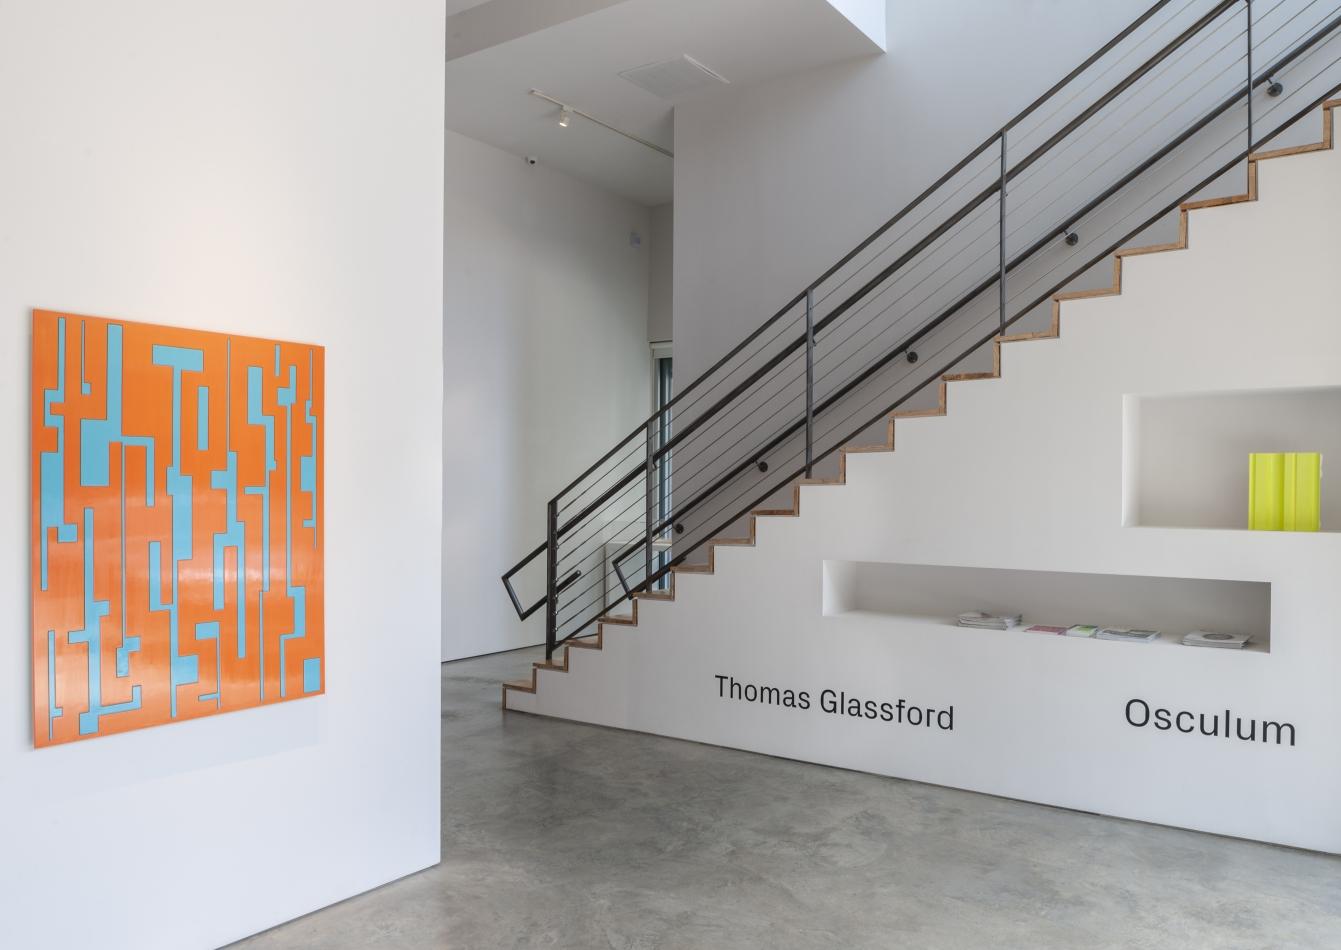 Thomas Glassford. Osculum